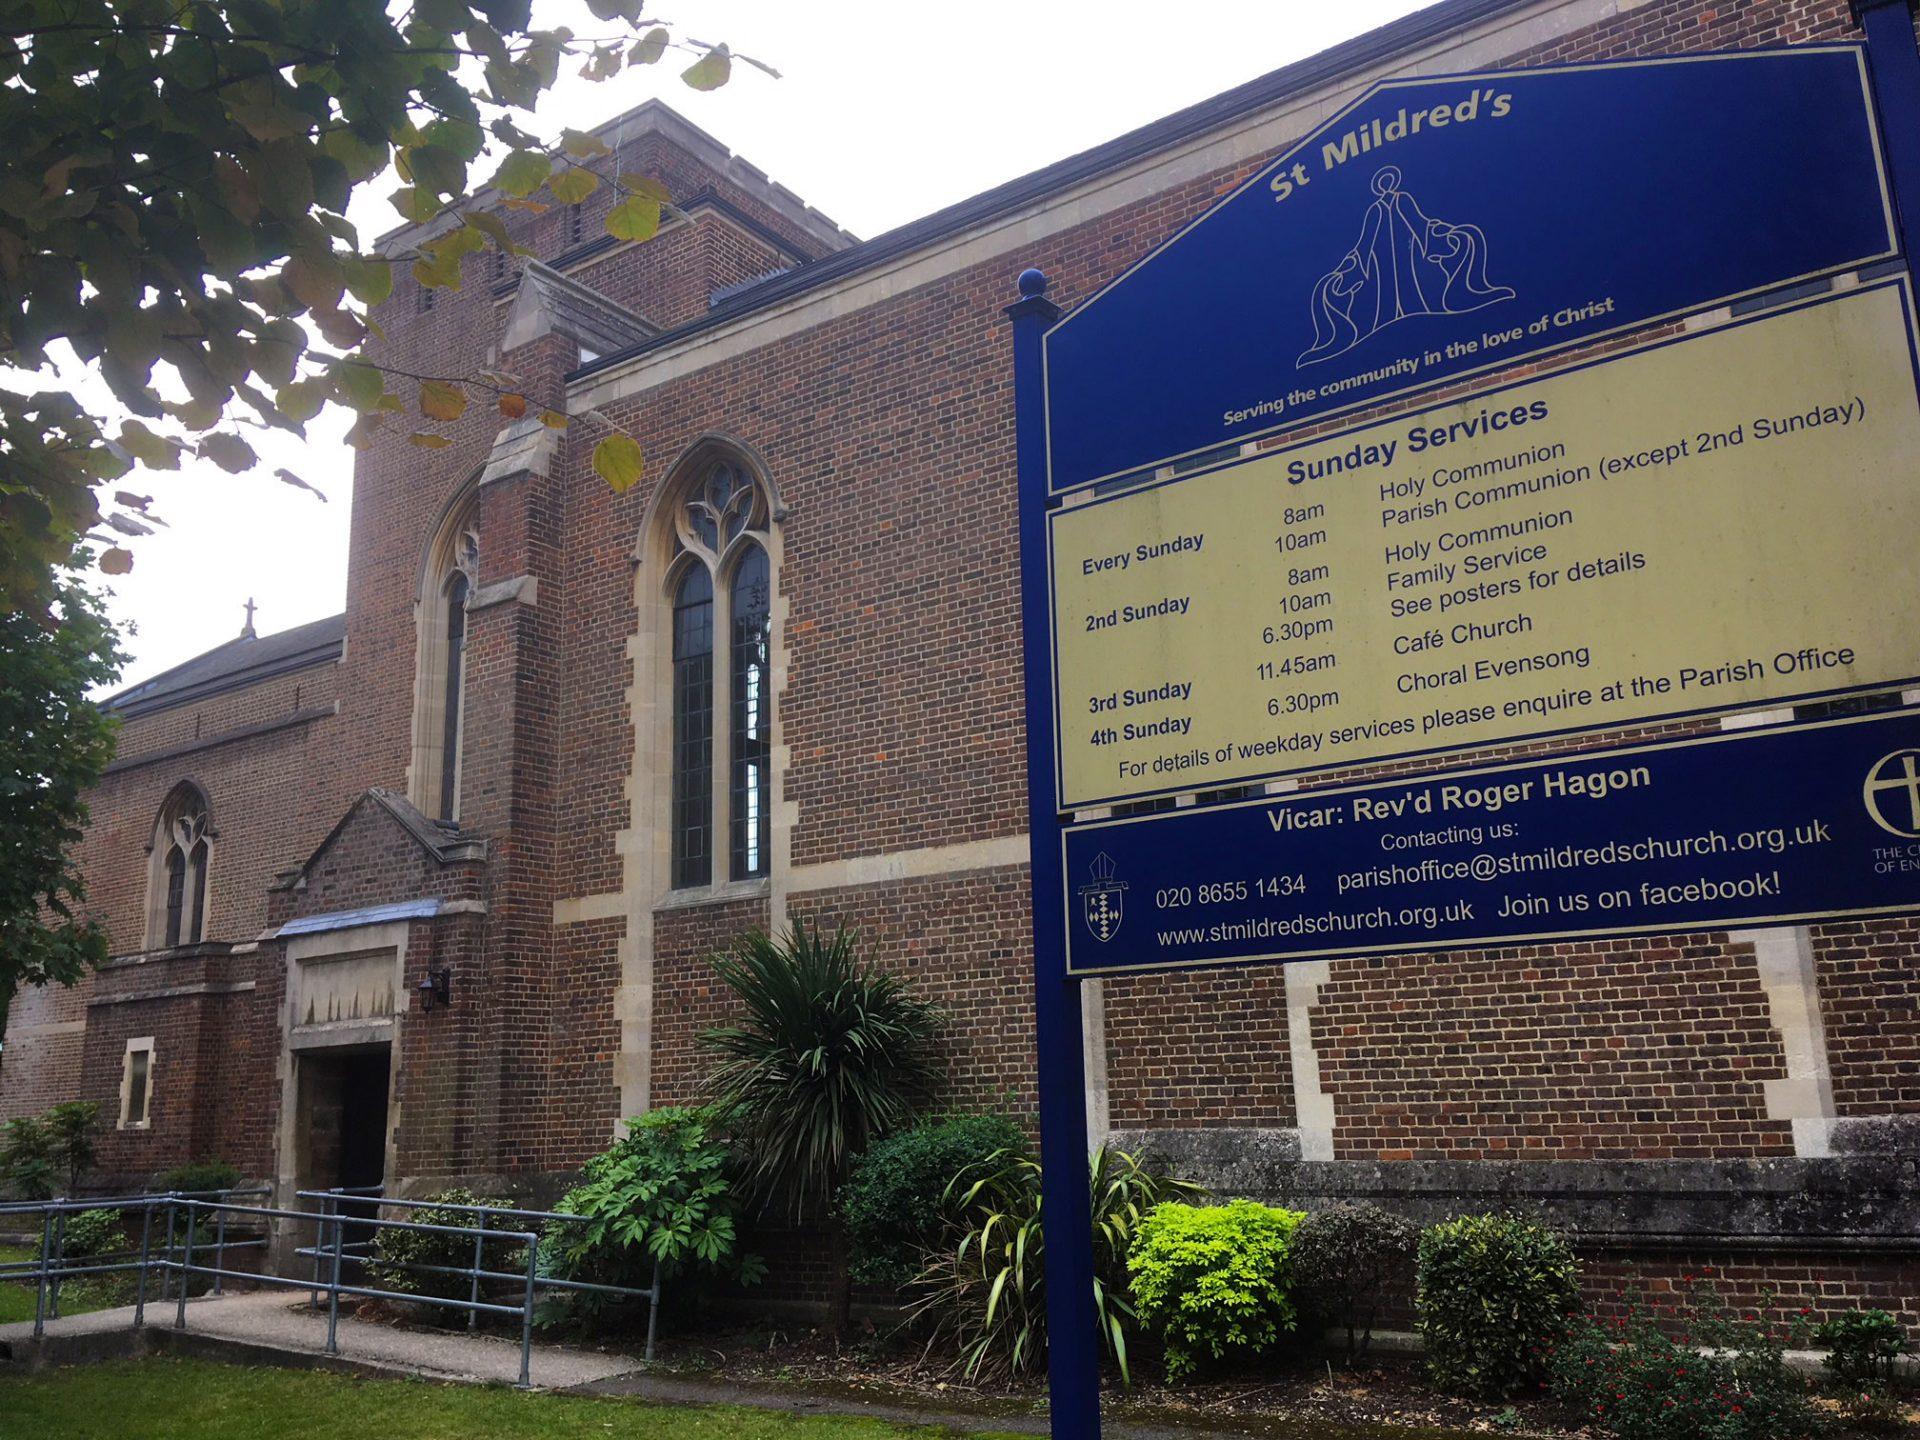 St-Mildreds-Church-exterior,-Addiscombe